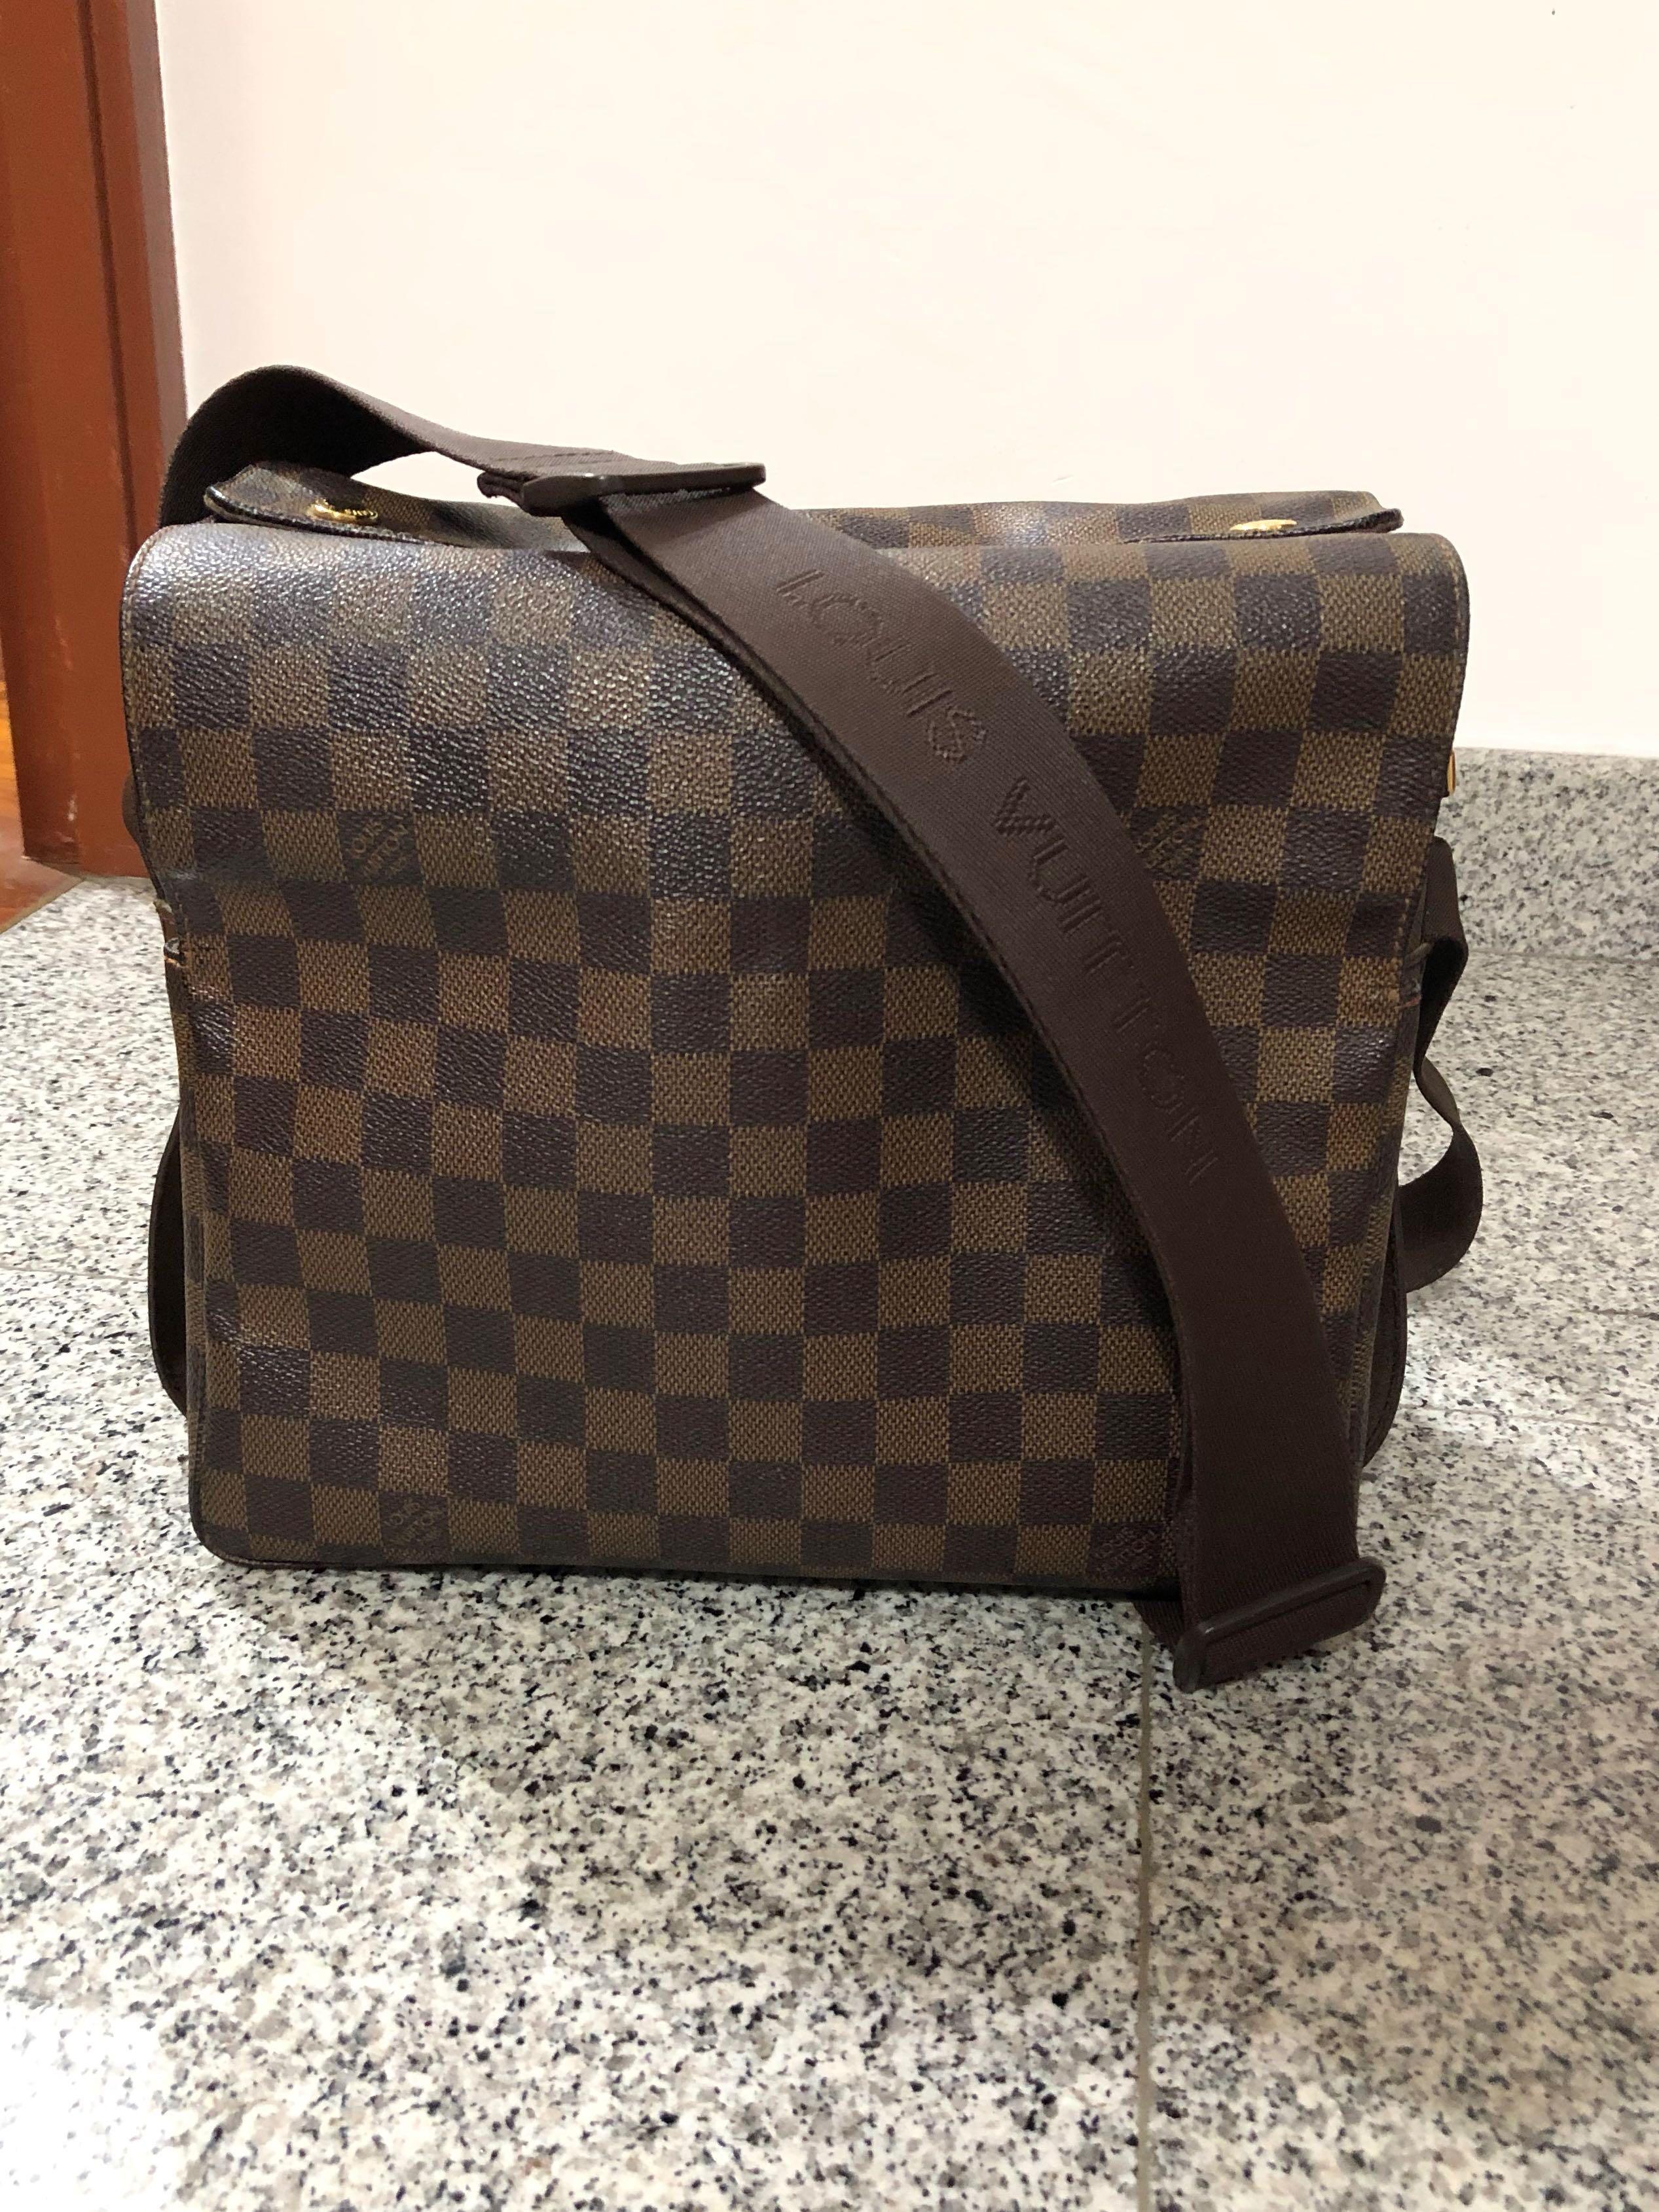 2a03624eb3e1 Louis Vuitton Sling Bag Messenger Naviglo Damier Ebene